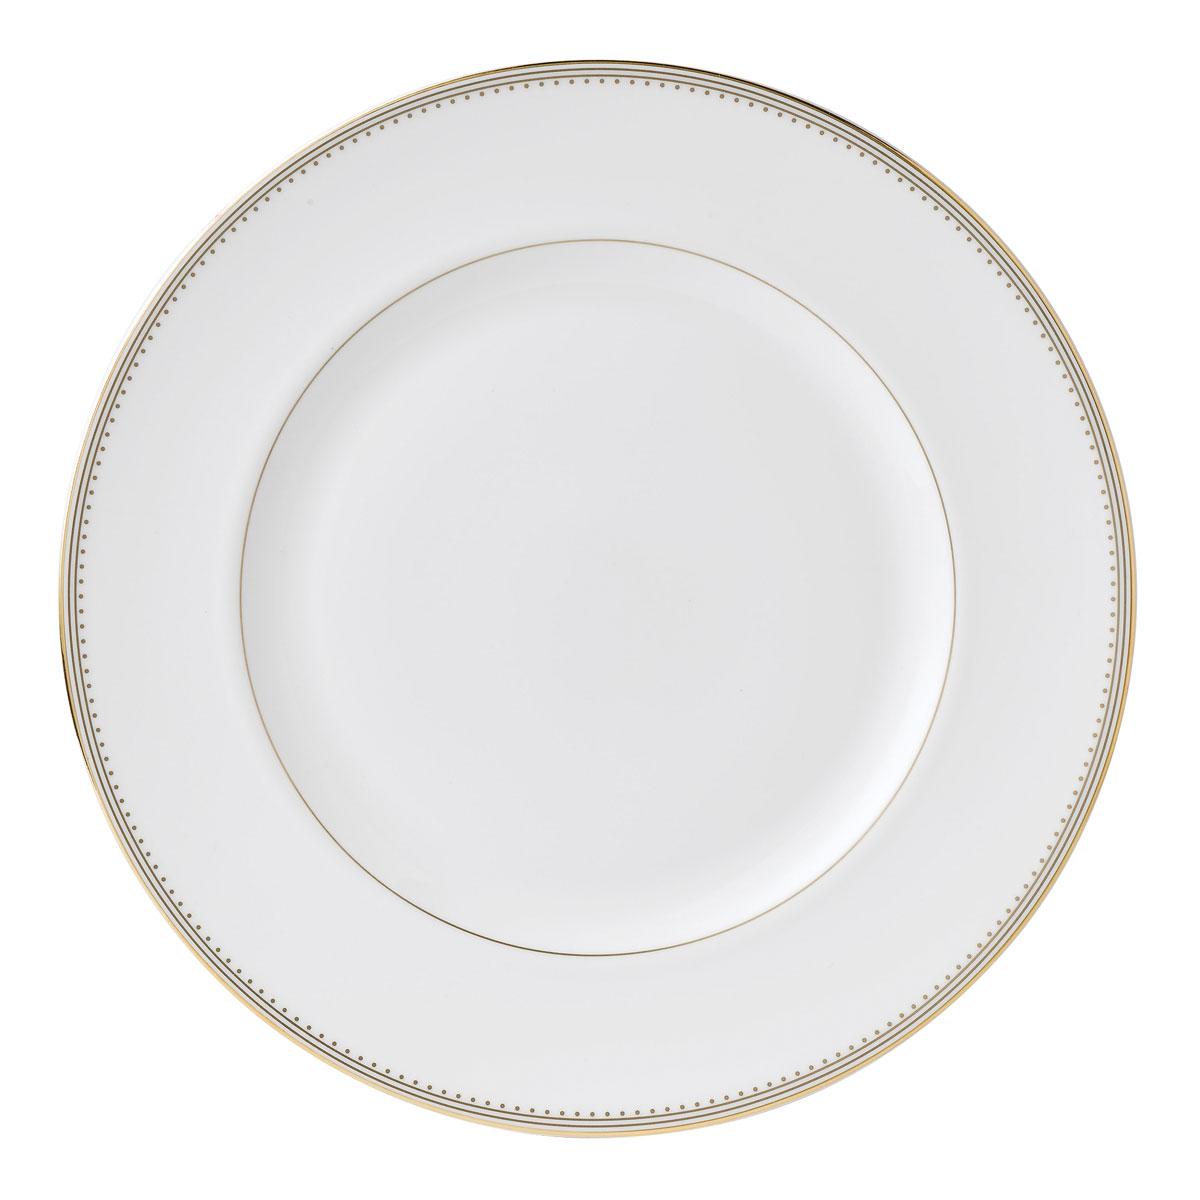 "Vera Wang Wedgwood Golden Grosgrain Dinner Plate 10.75"""